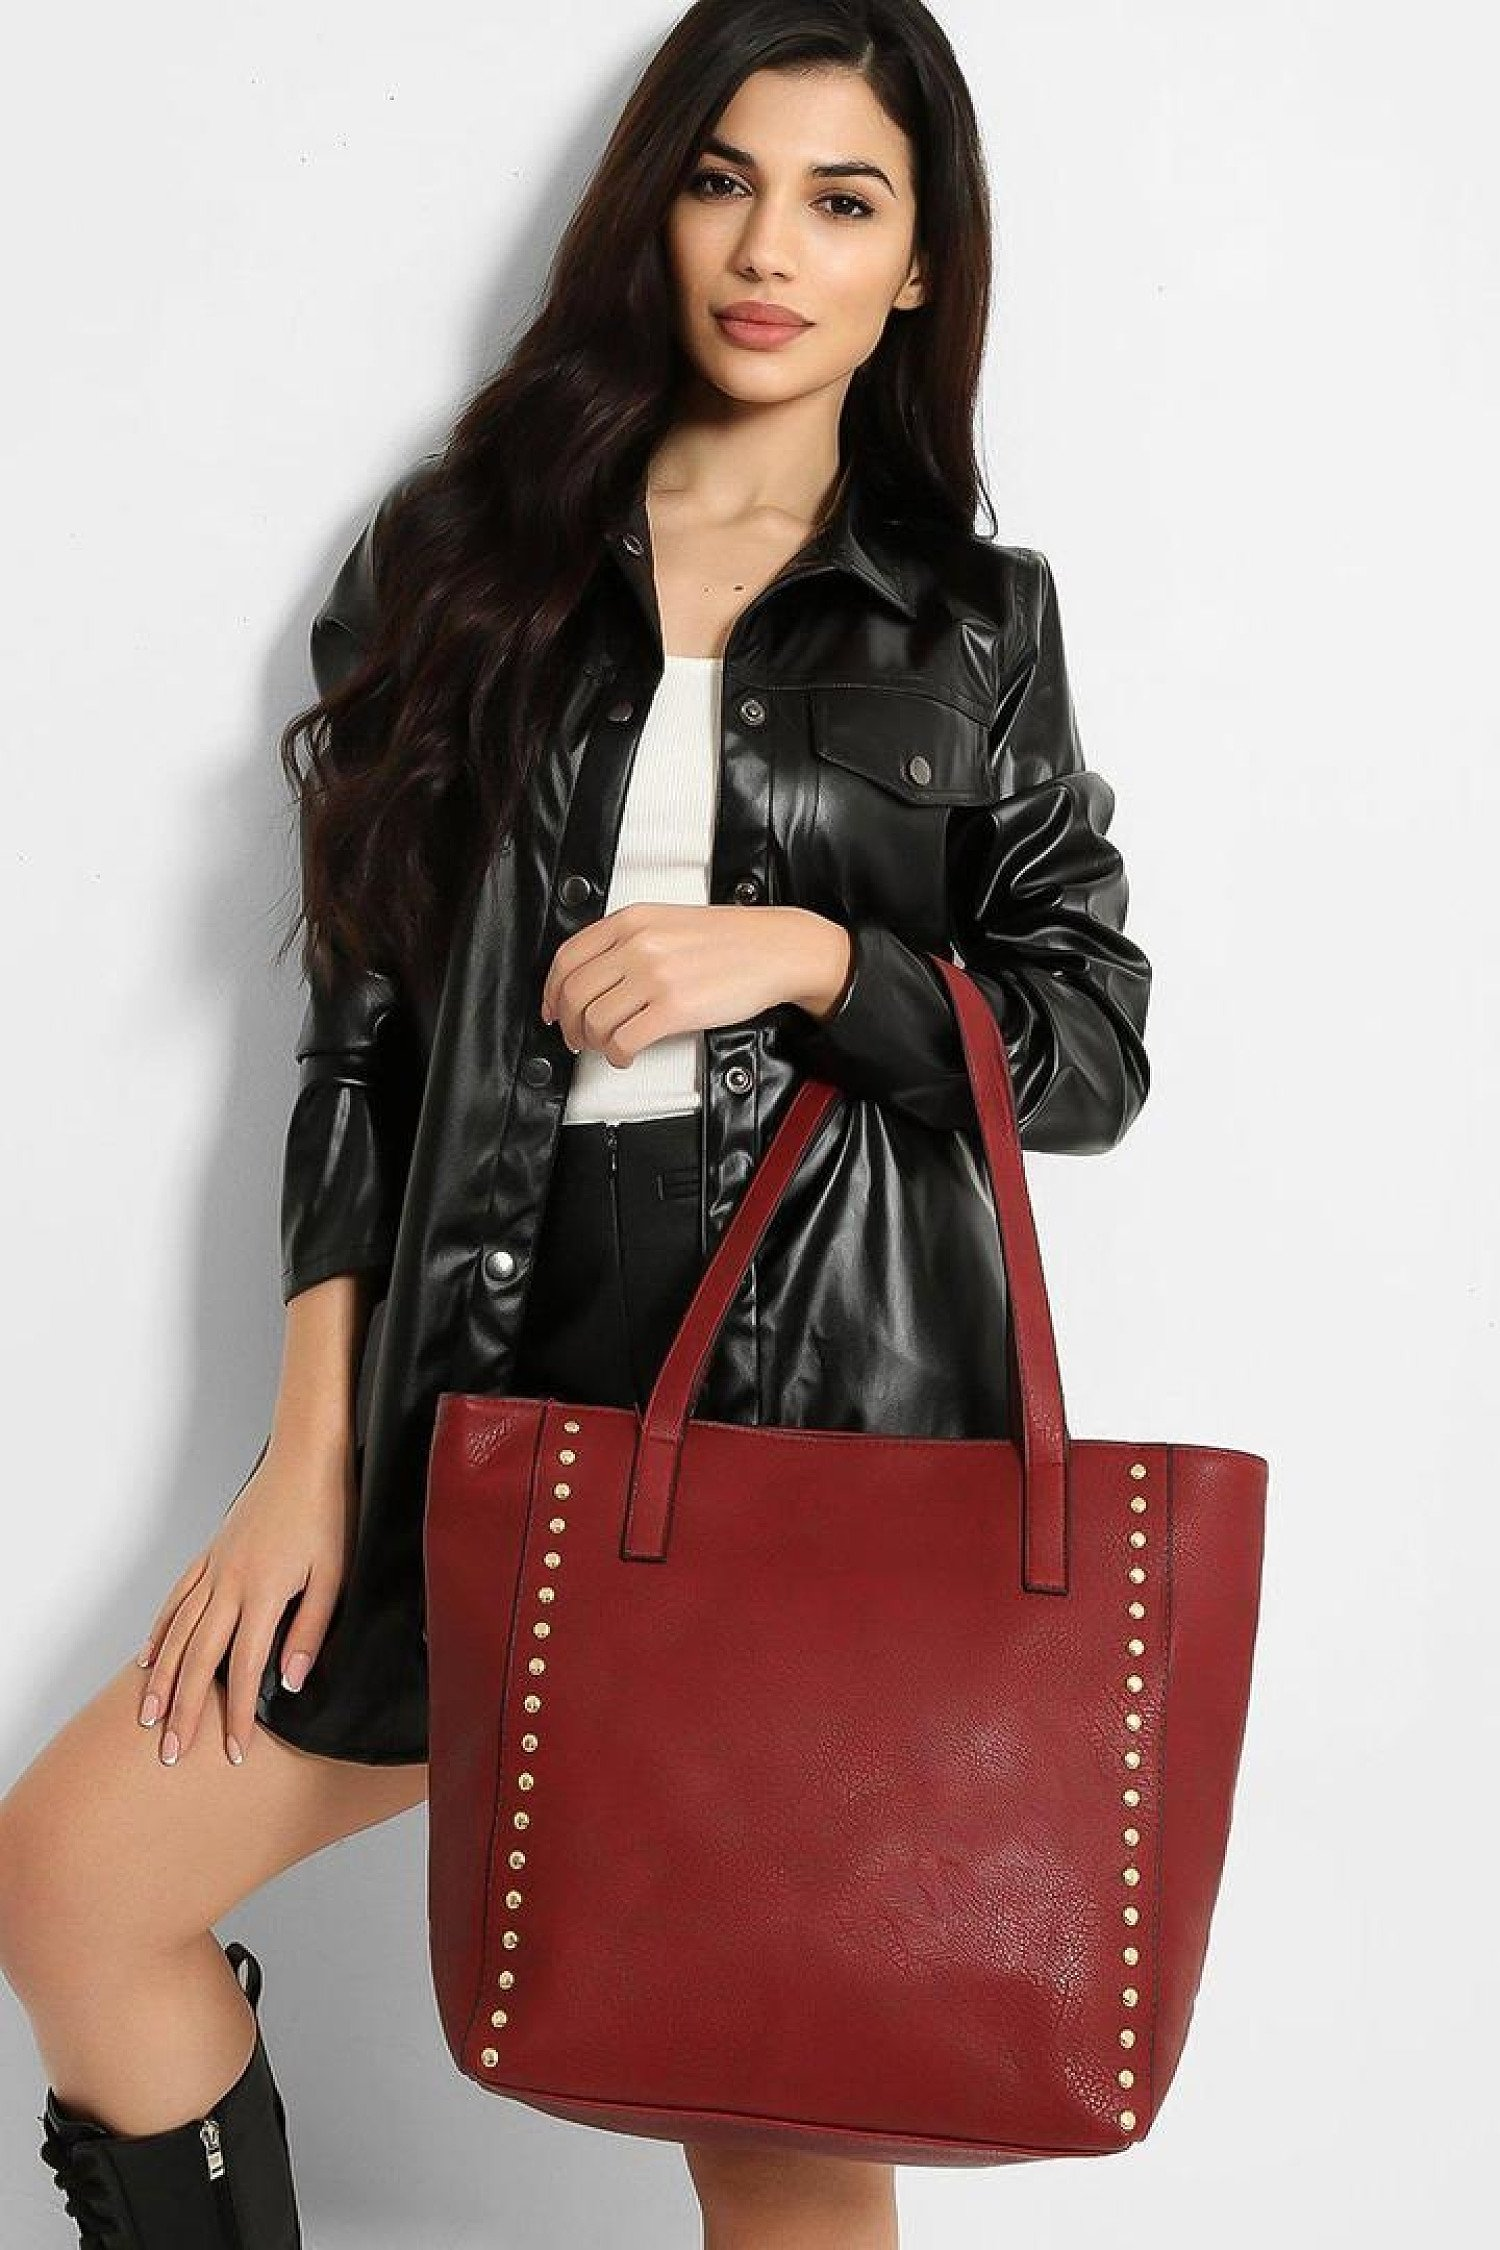 Dark Red Leather Gold Stud Bag Free Postage